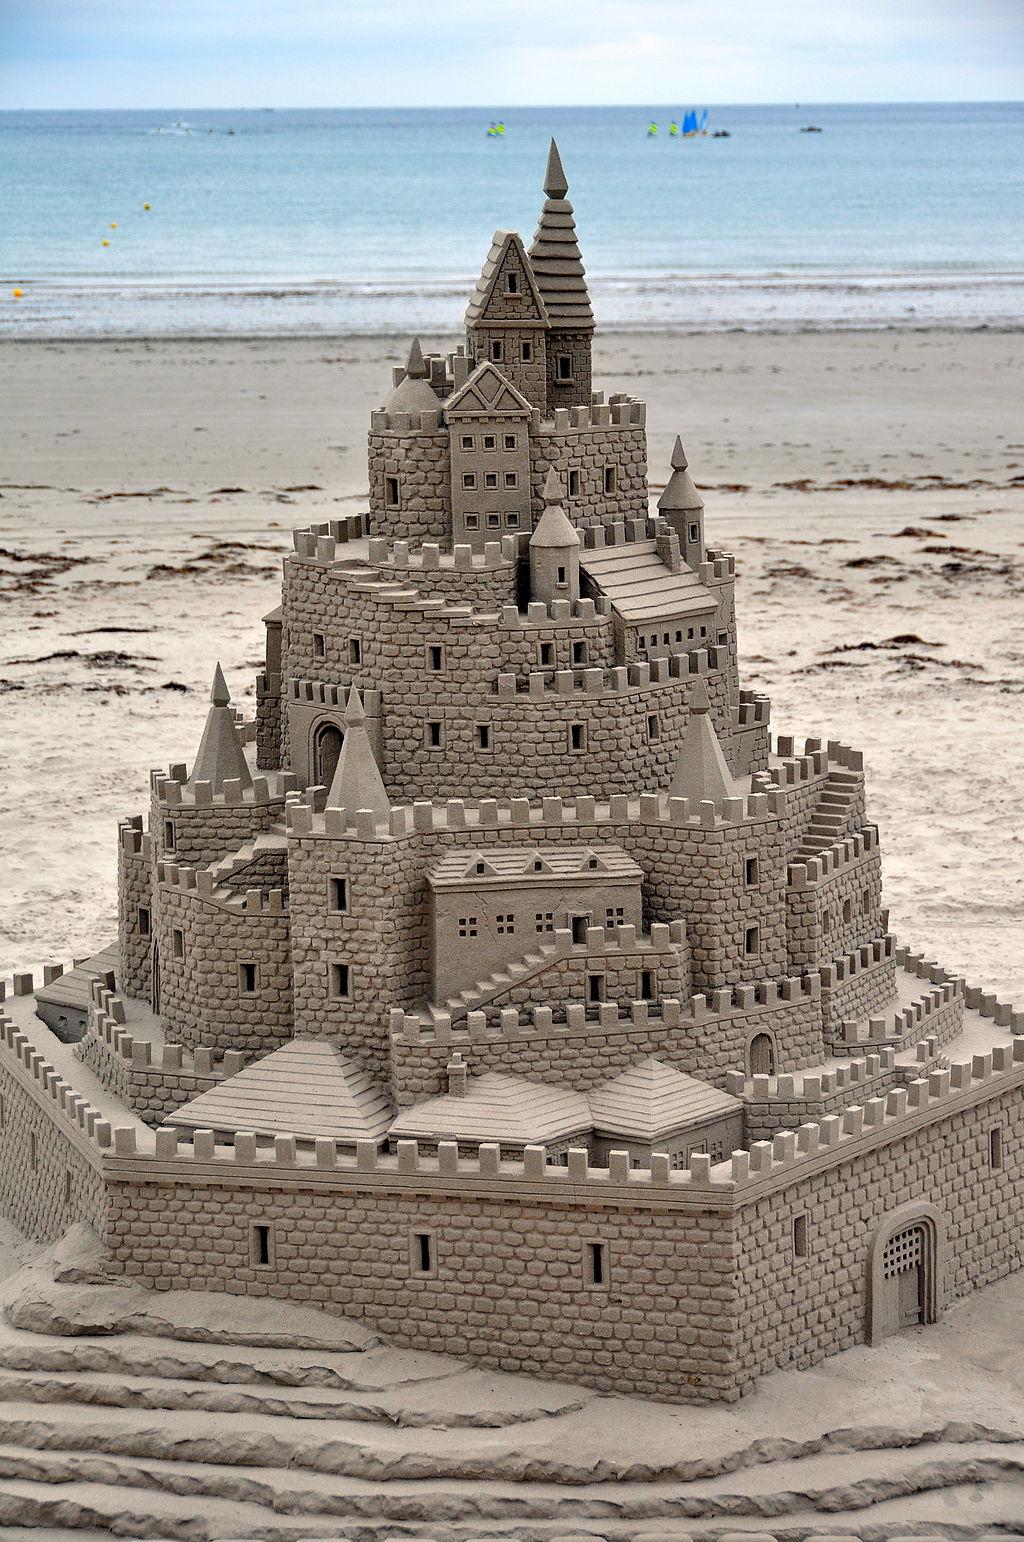 The Speculative Salon: Fantasy Sand Castle Art